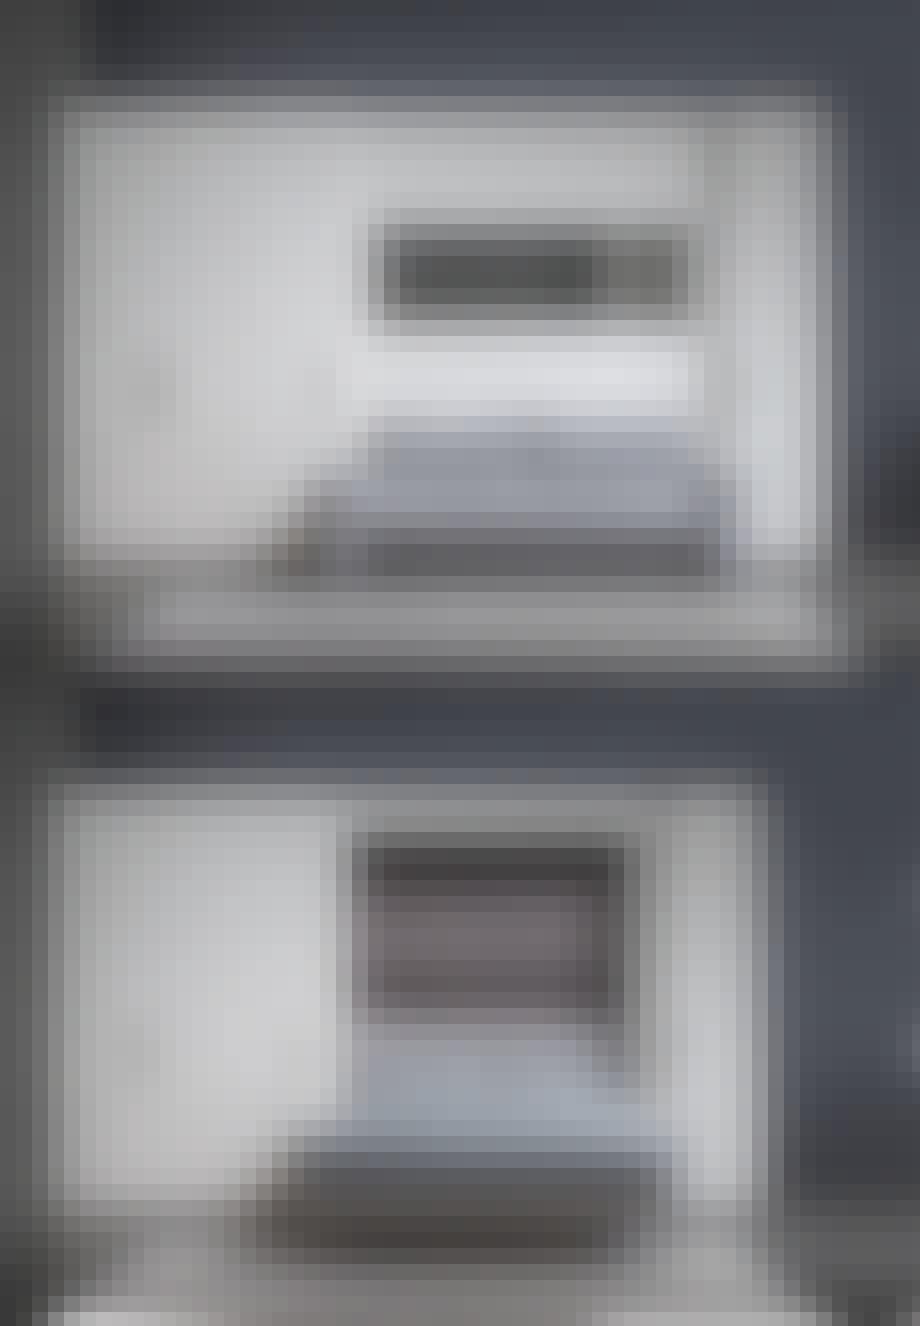 Flou sofaseng i grå